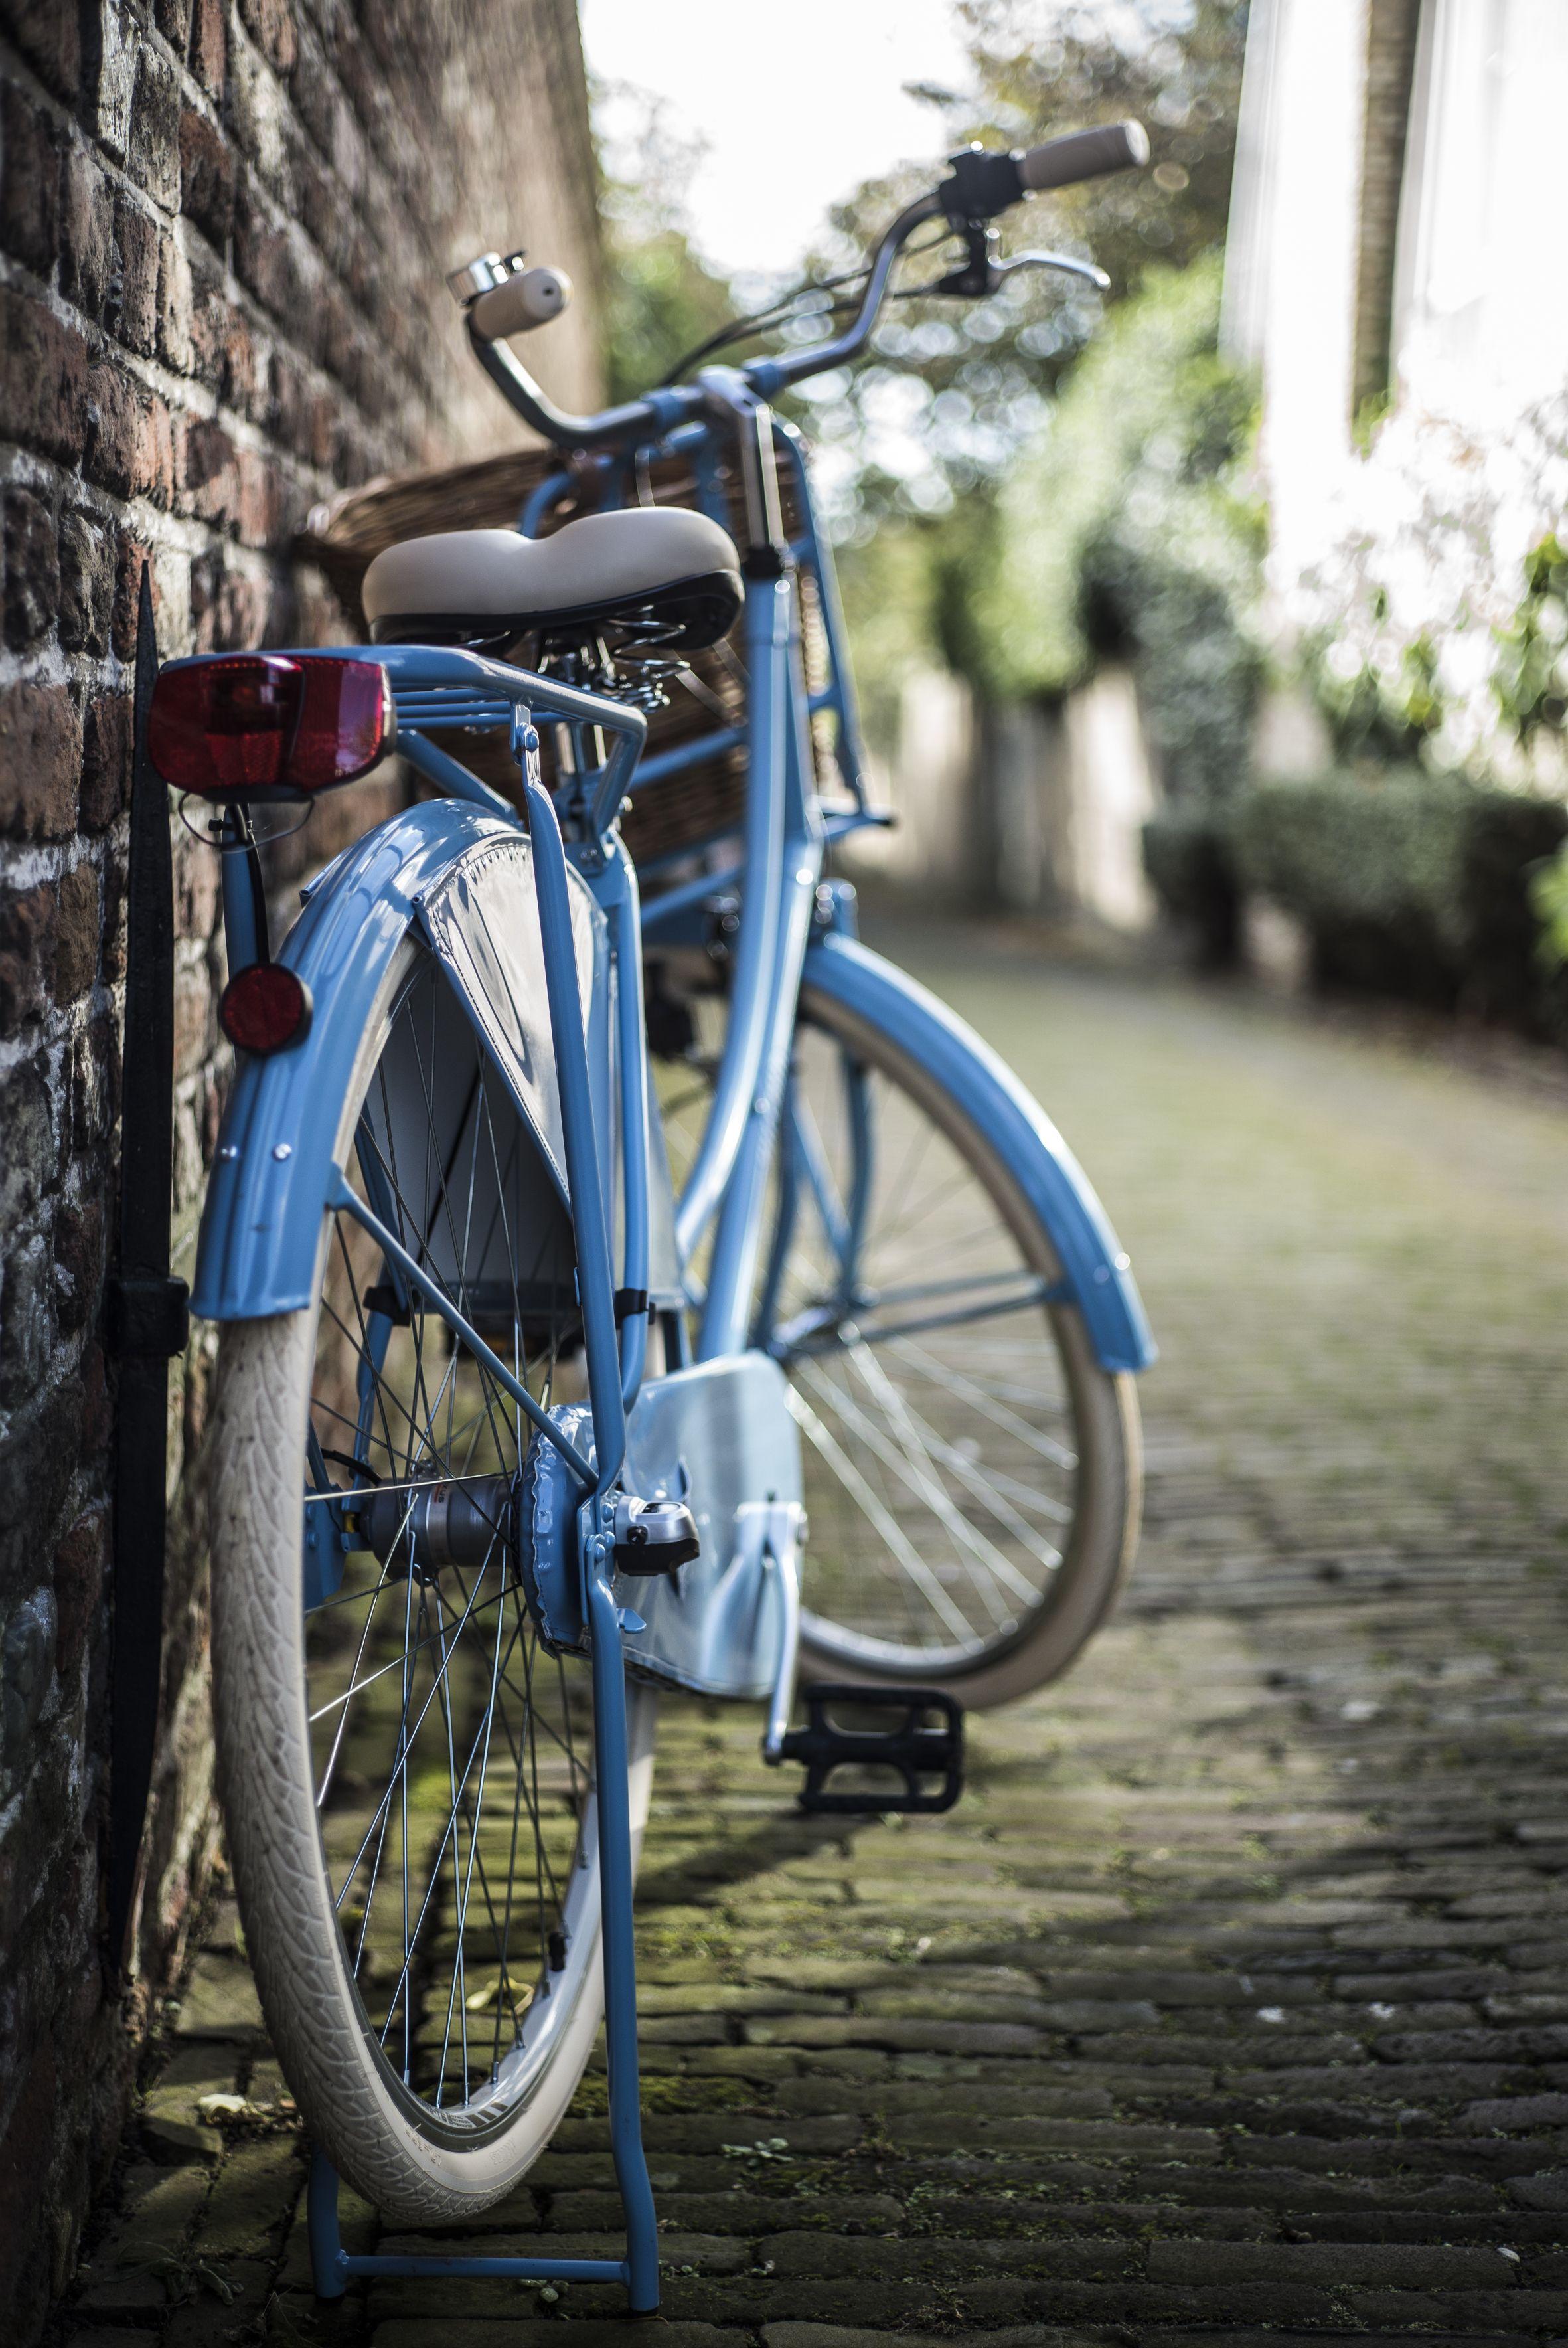 ks cycling cityrad tussaud 3 gang shimano nexus schaltwerk nabenschaltung auf rechnung. Black Bedroom Furniture Sets. Home Design Ideas